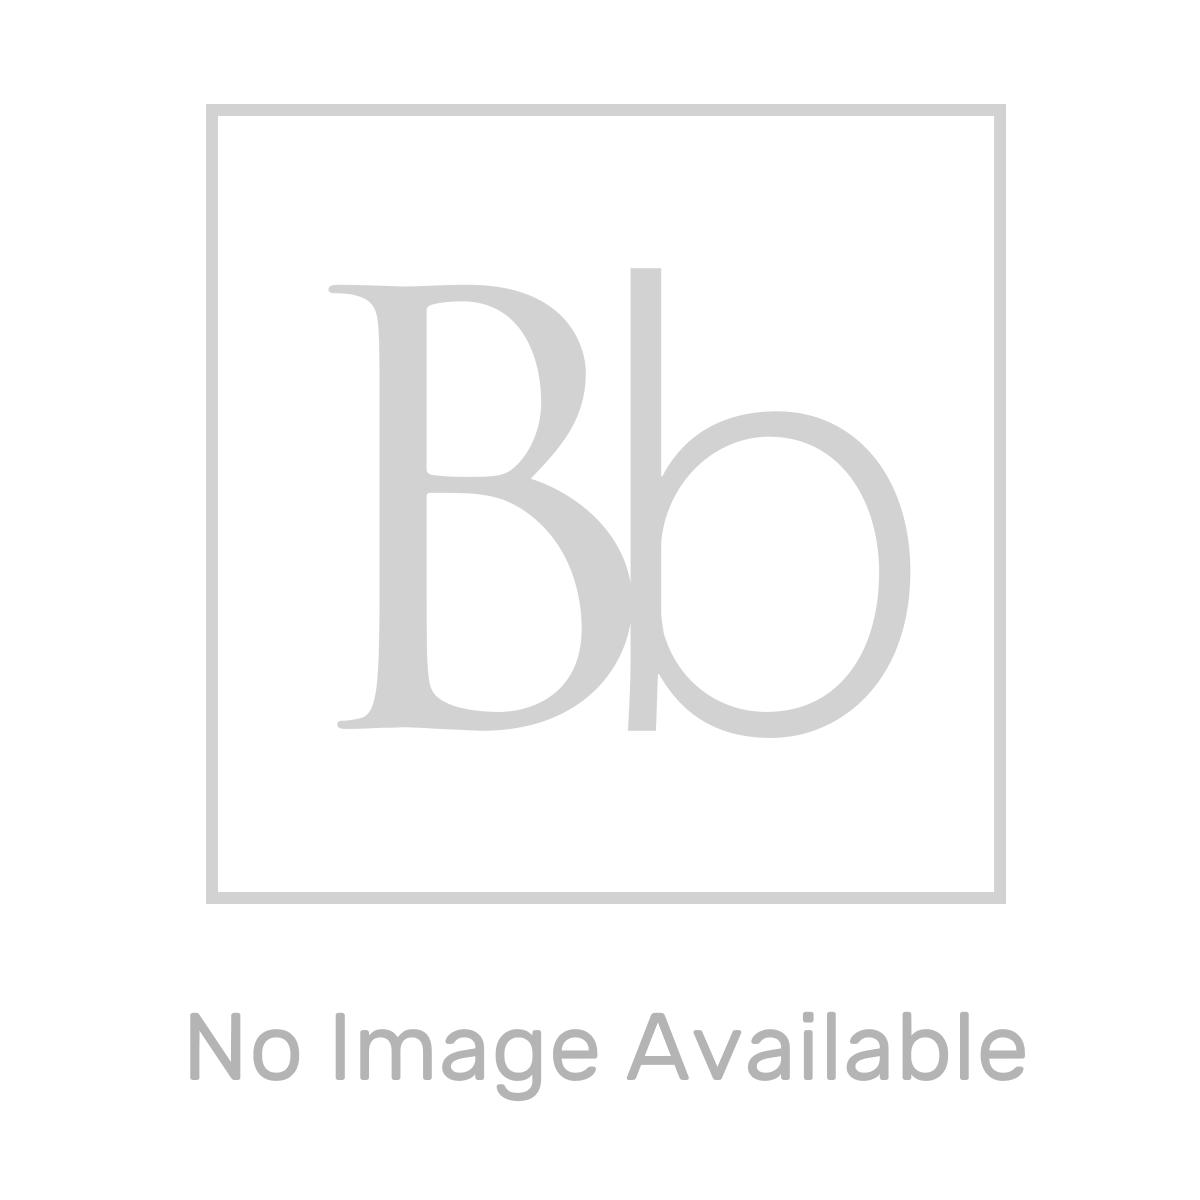 RAK Compact Basin with Full Pedestal 550mm